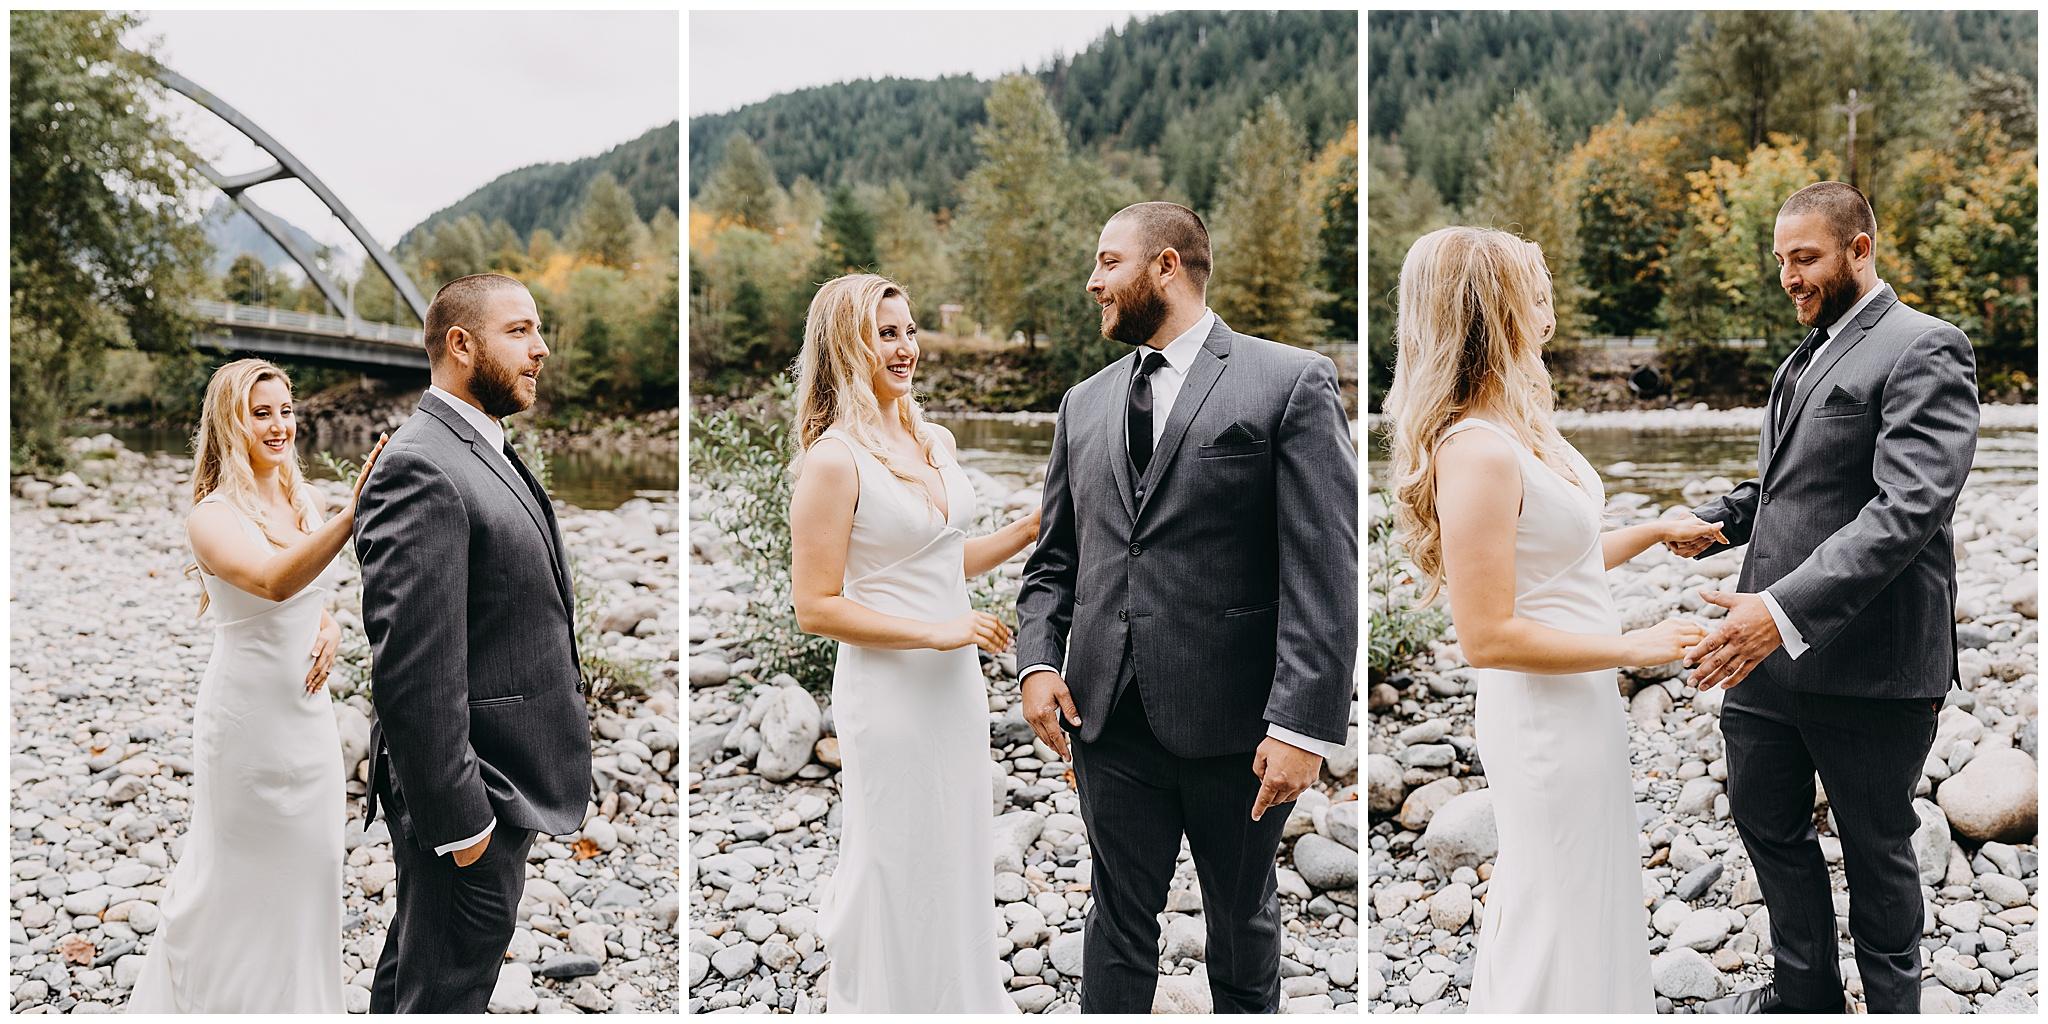 index-wa-wedding17.jpg